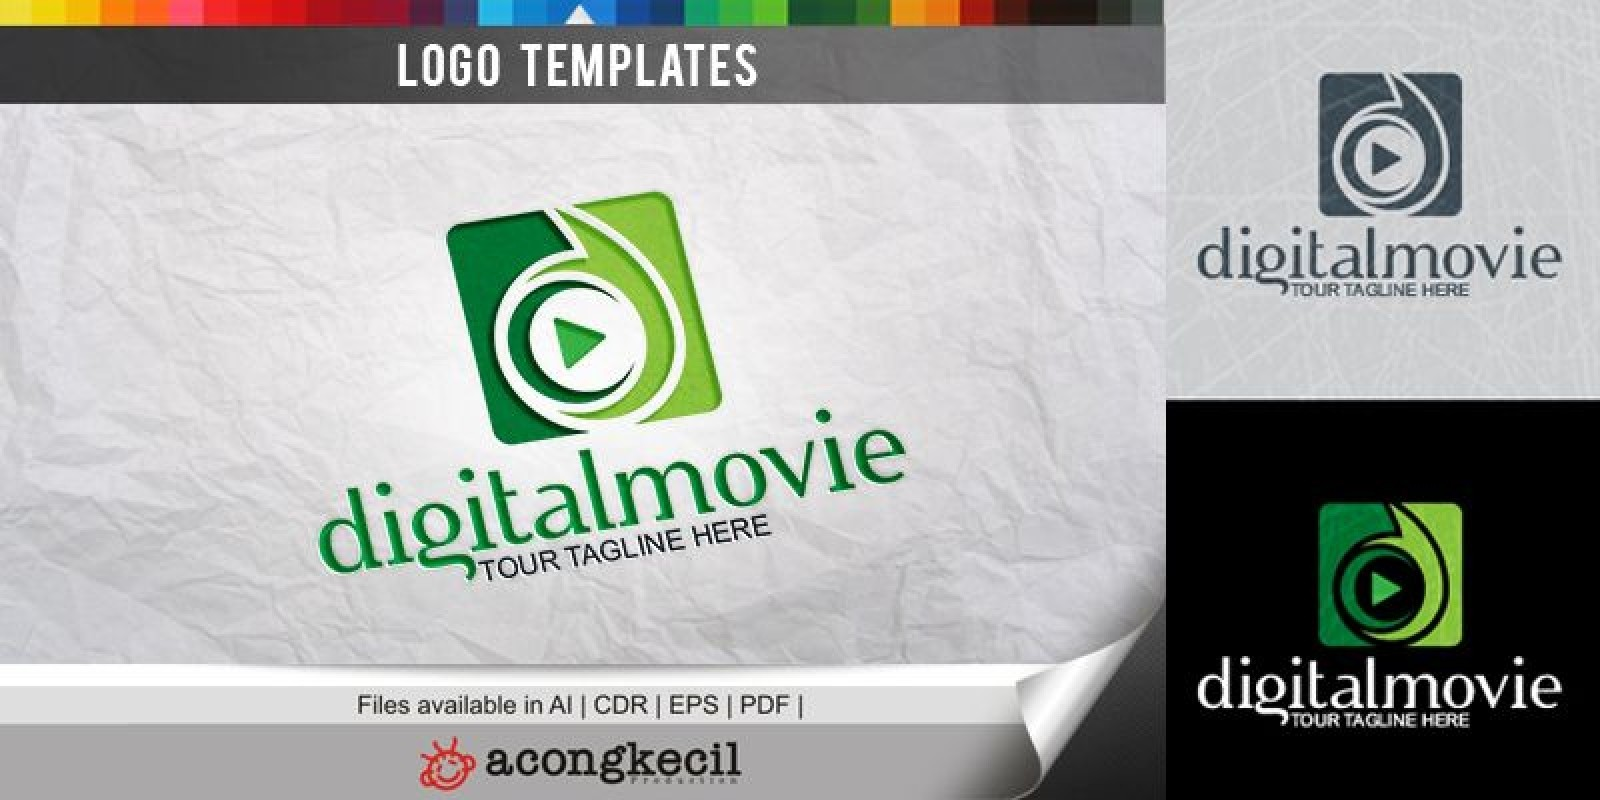 Digital Movie - Logo Template